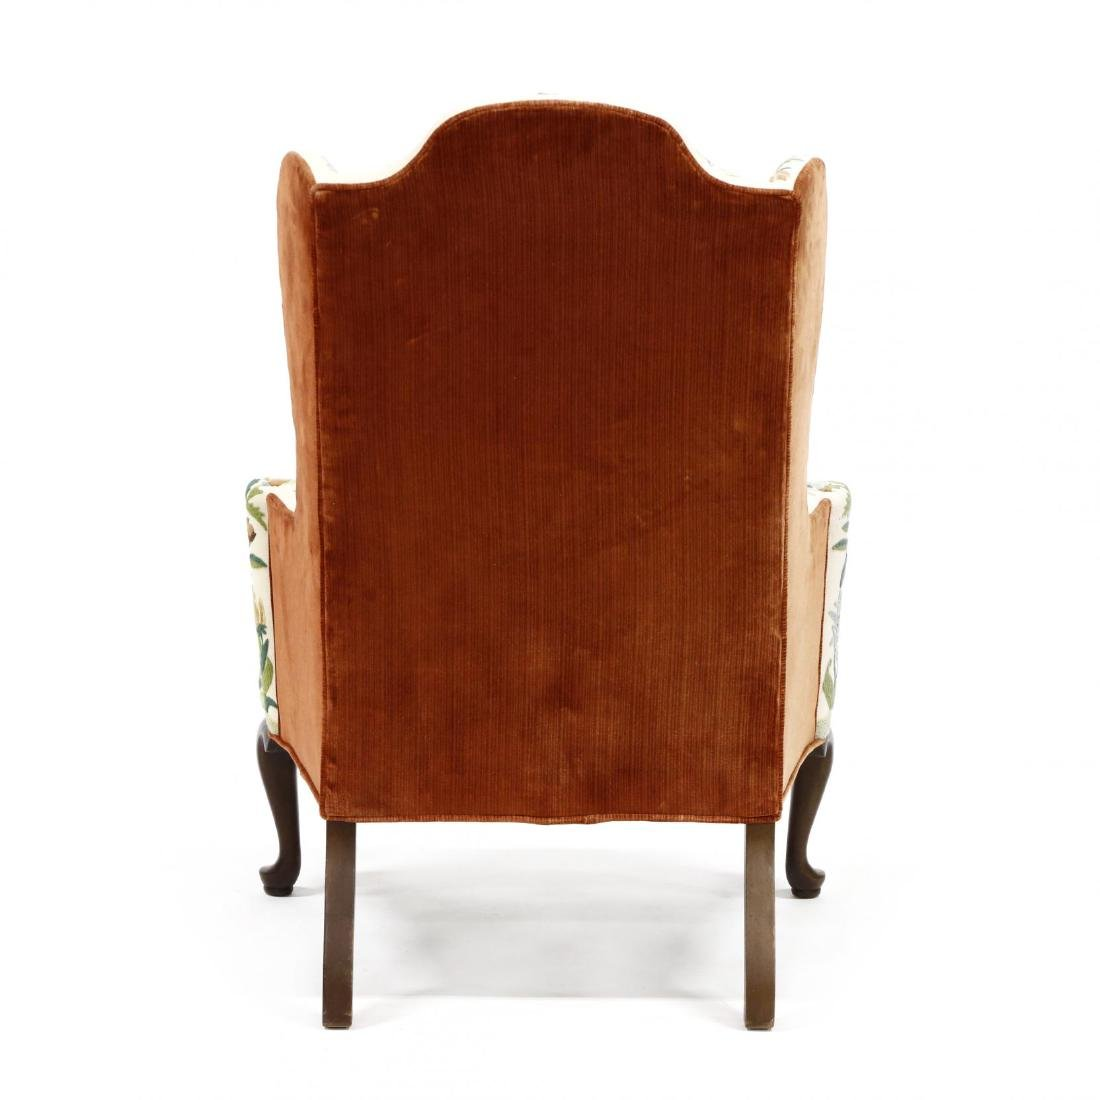 Woodmark Originals, Pair of Crewelwork Upholstered Wing - 2